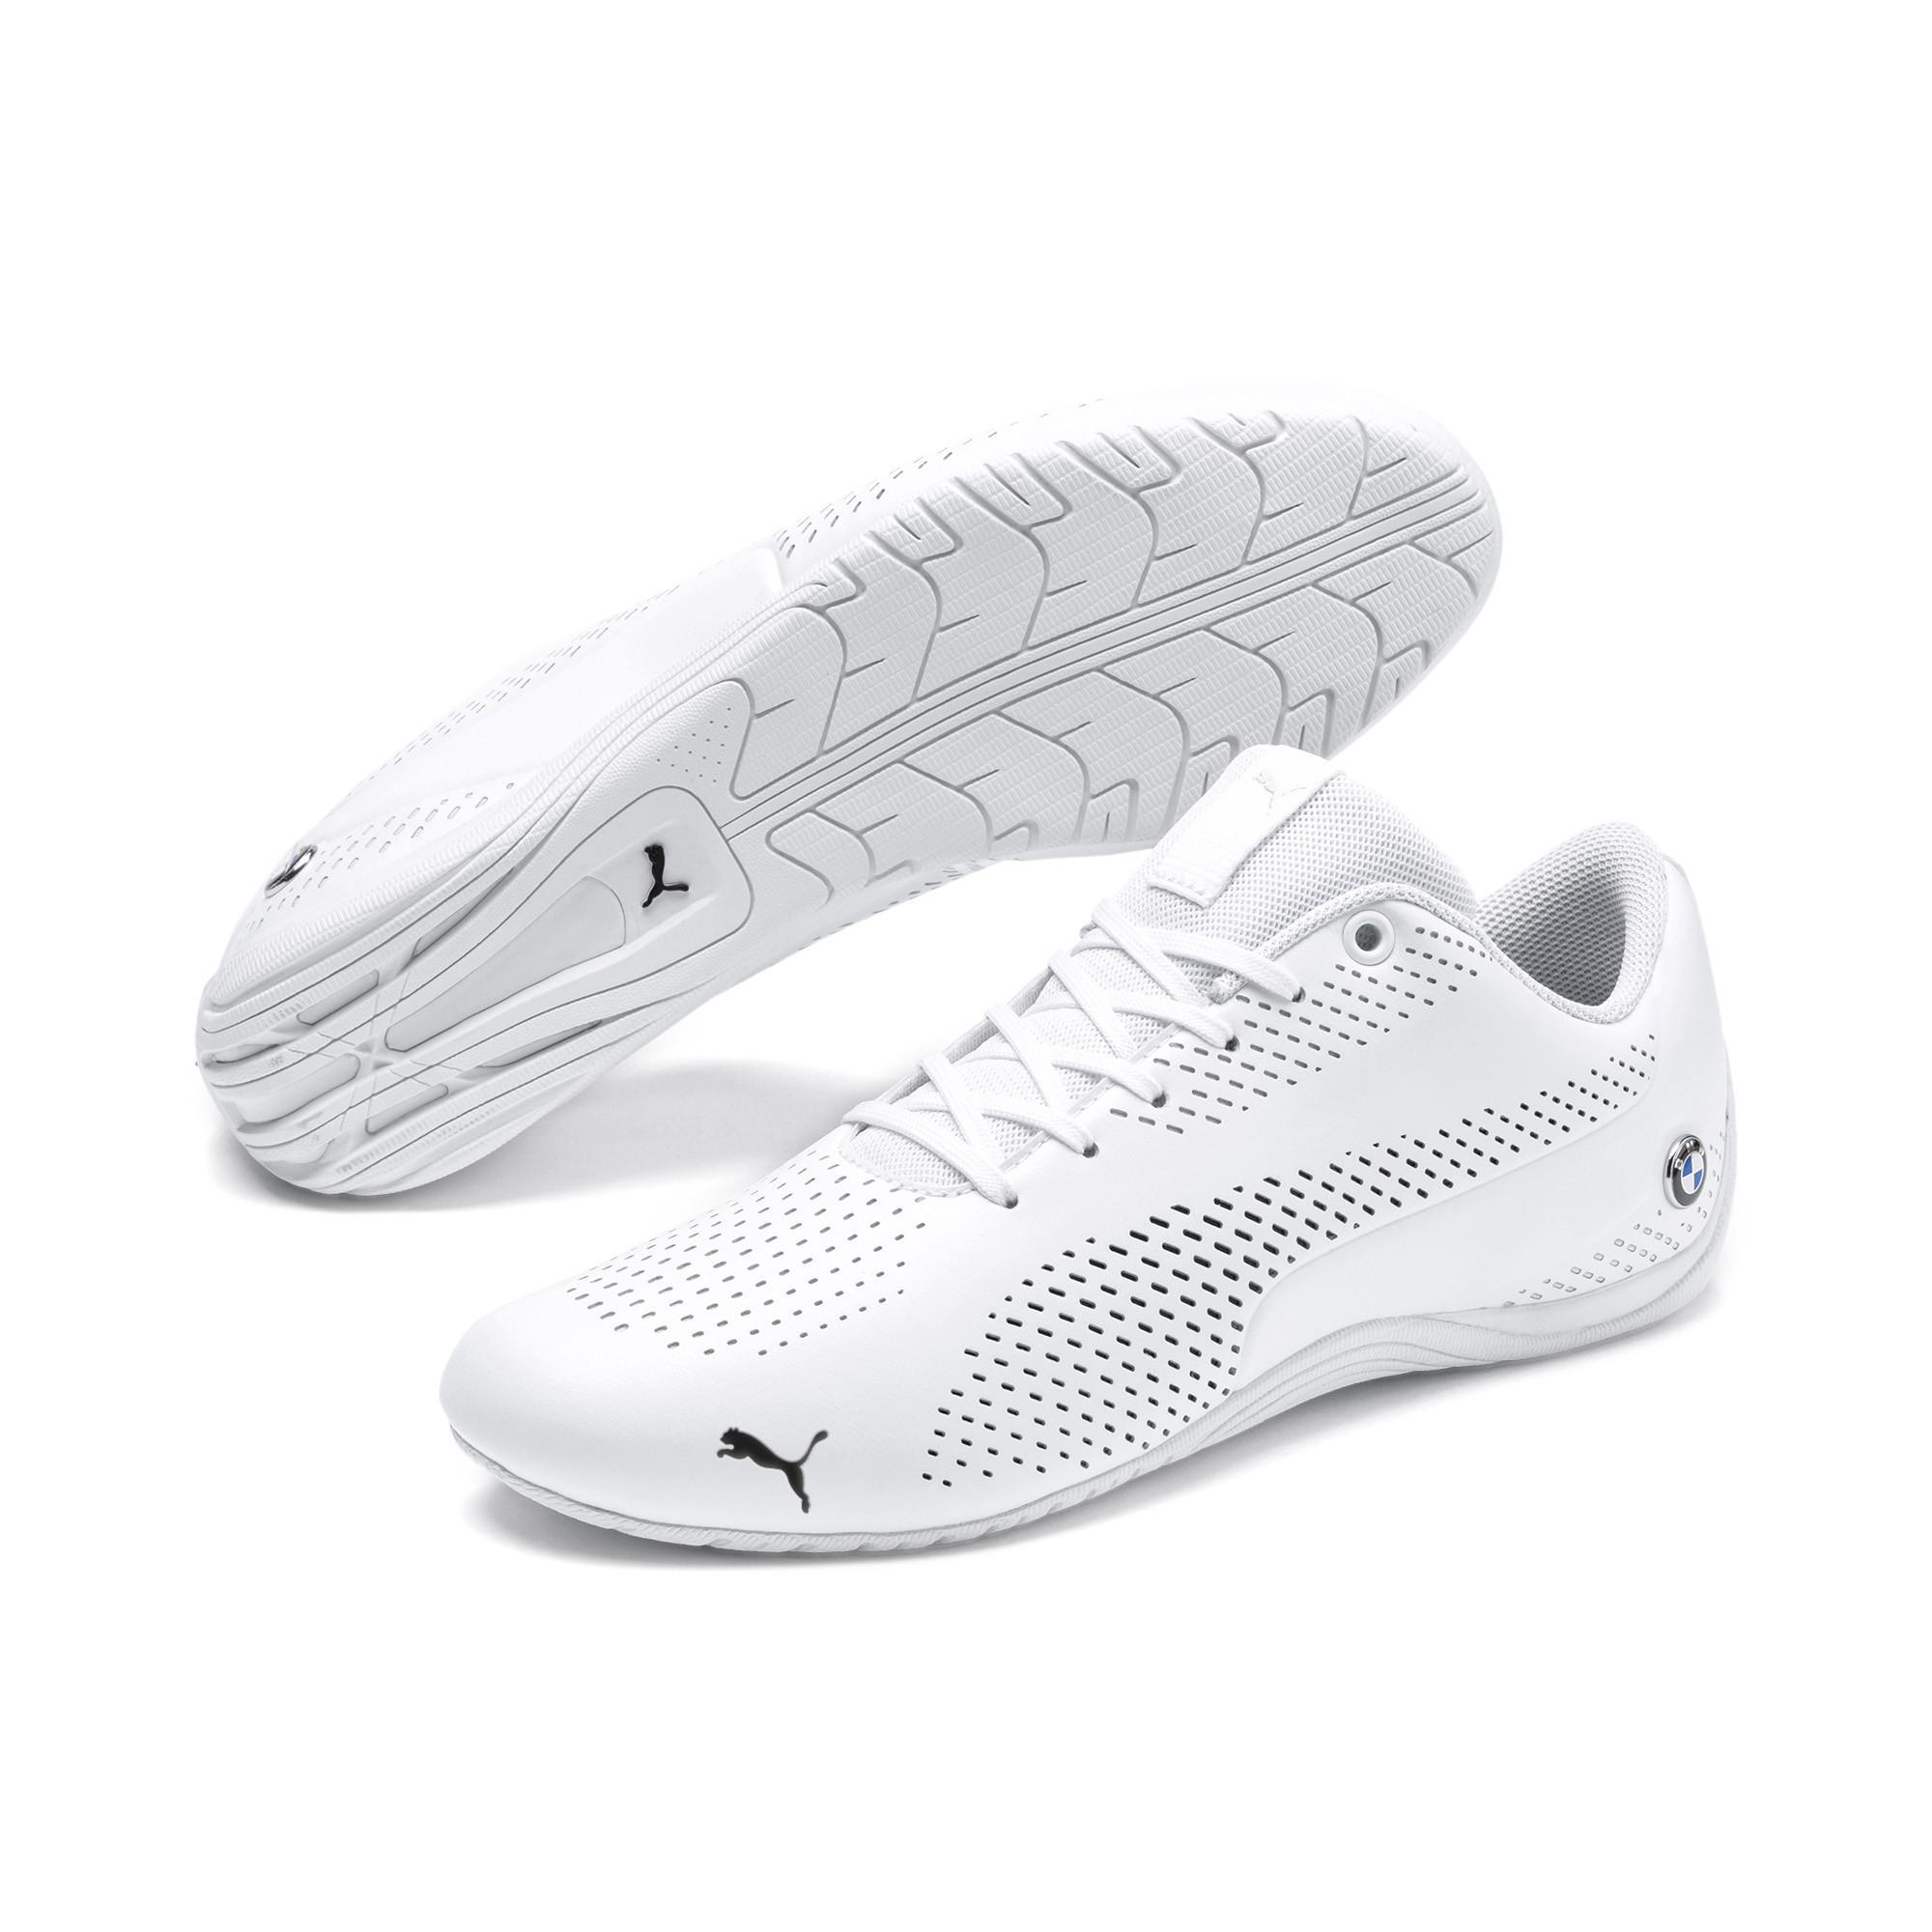 ca28f60fbf5 ... Bmw Mms Drift Cat 5 Ultra Ii Men s Sneakers for Men - Lyst. View  fullscreen